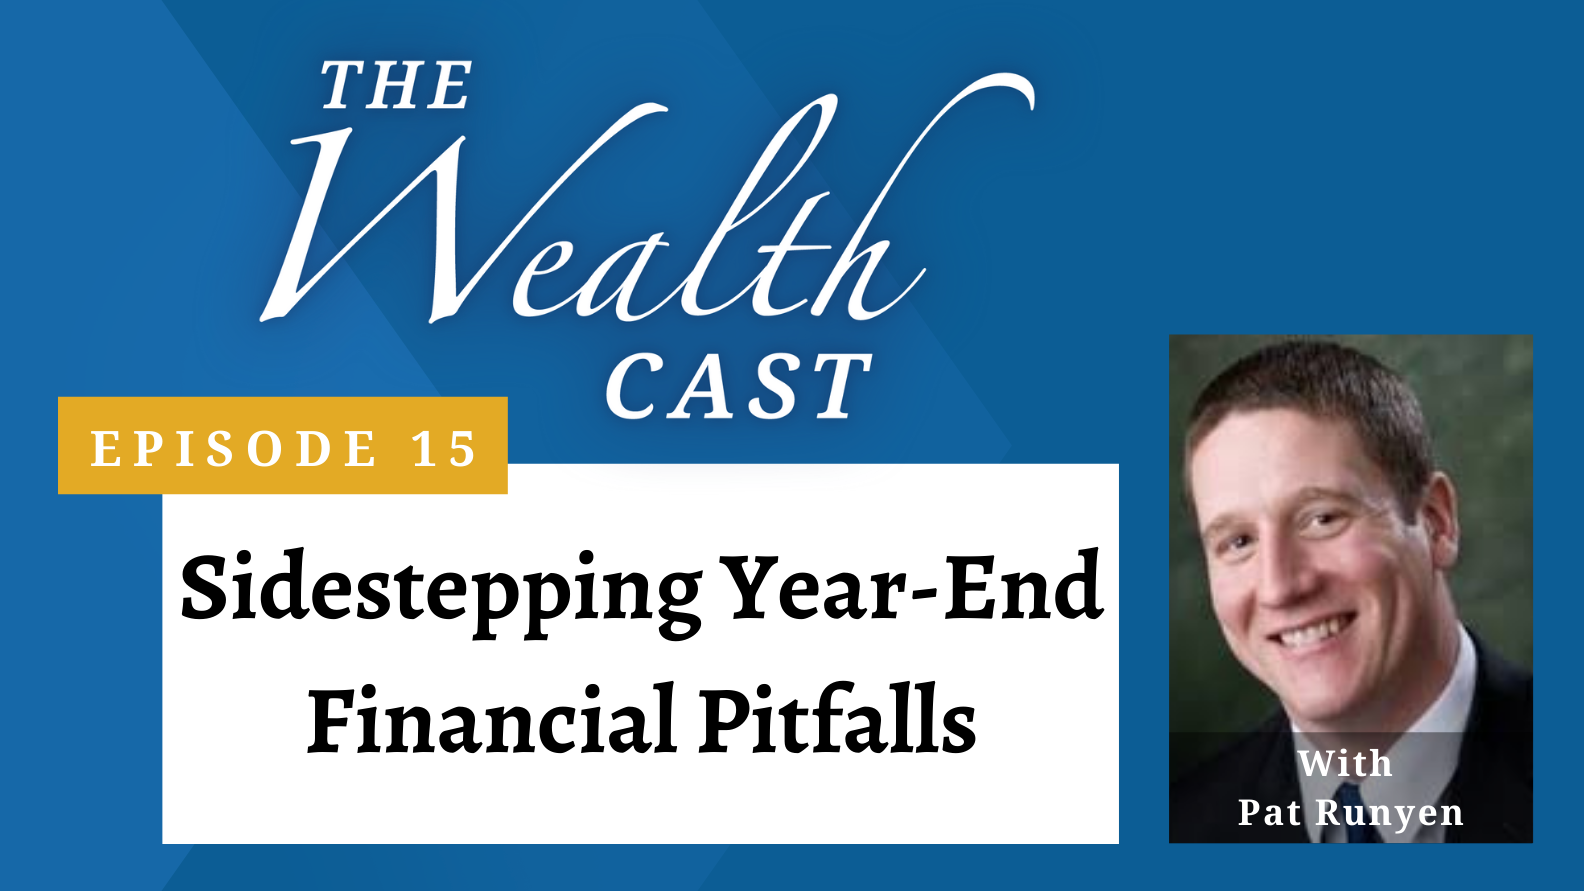 The Wealth Cast Ep 15 - Pat Runyen - Sidestepping Year-End Financial Pitfalls